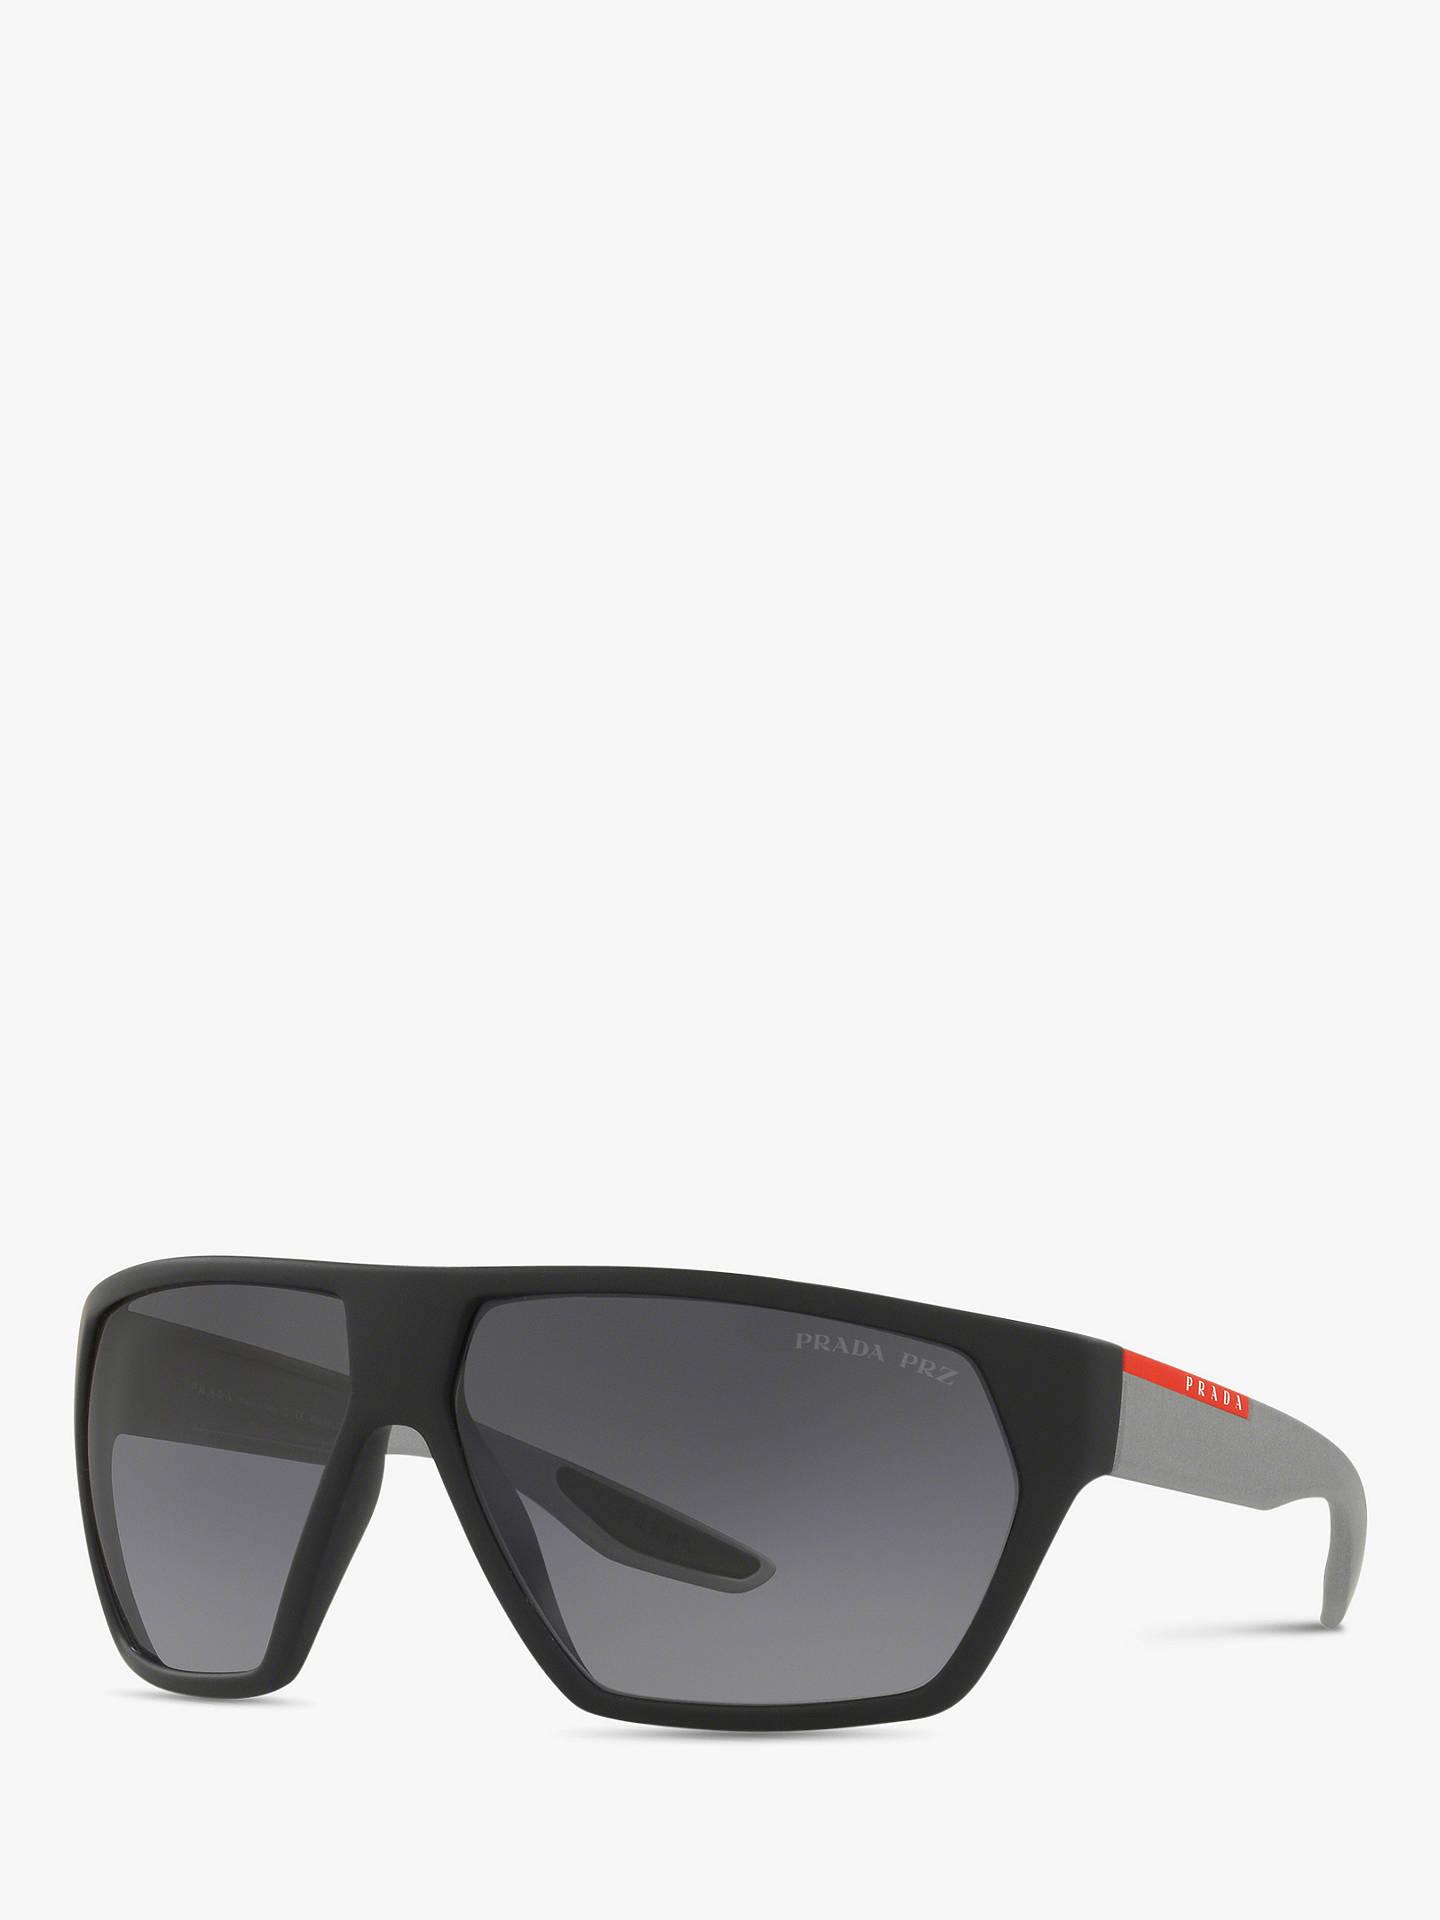 50e16181bbfa Buy Prada PS 08US Men s Rectangular Sunglasses